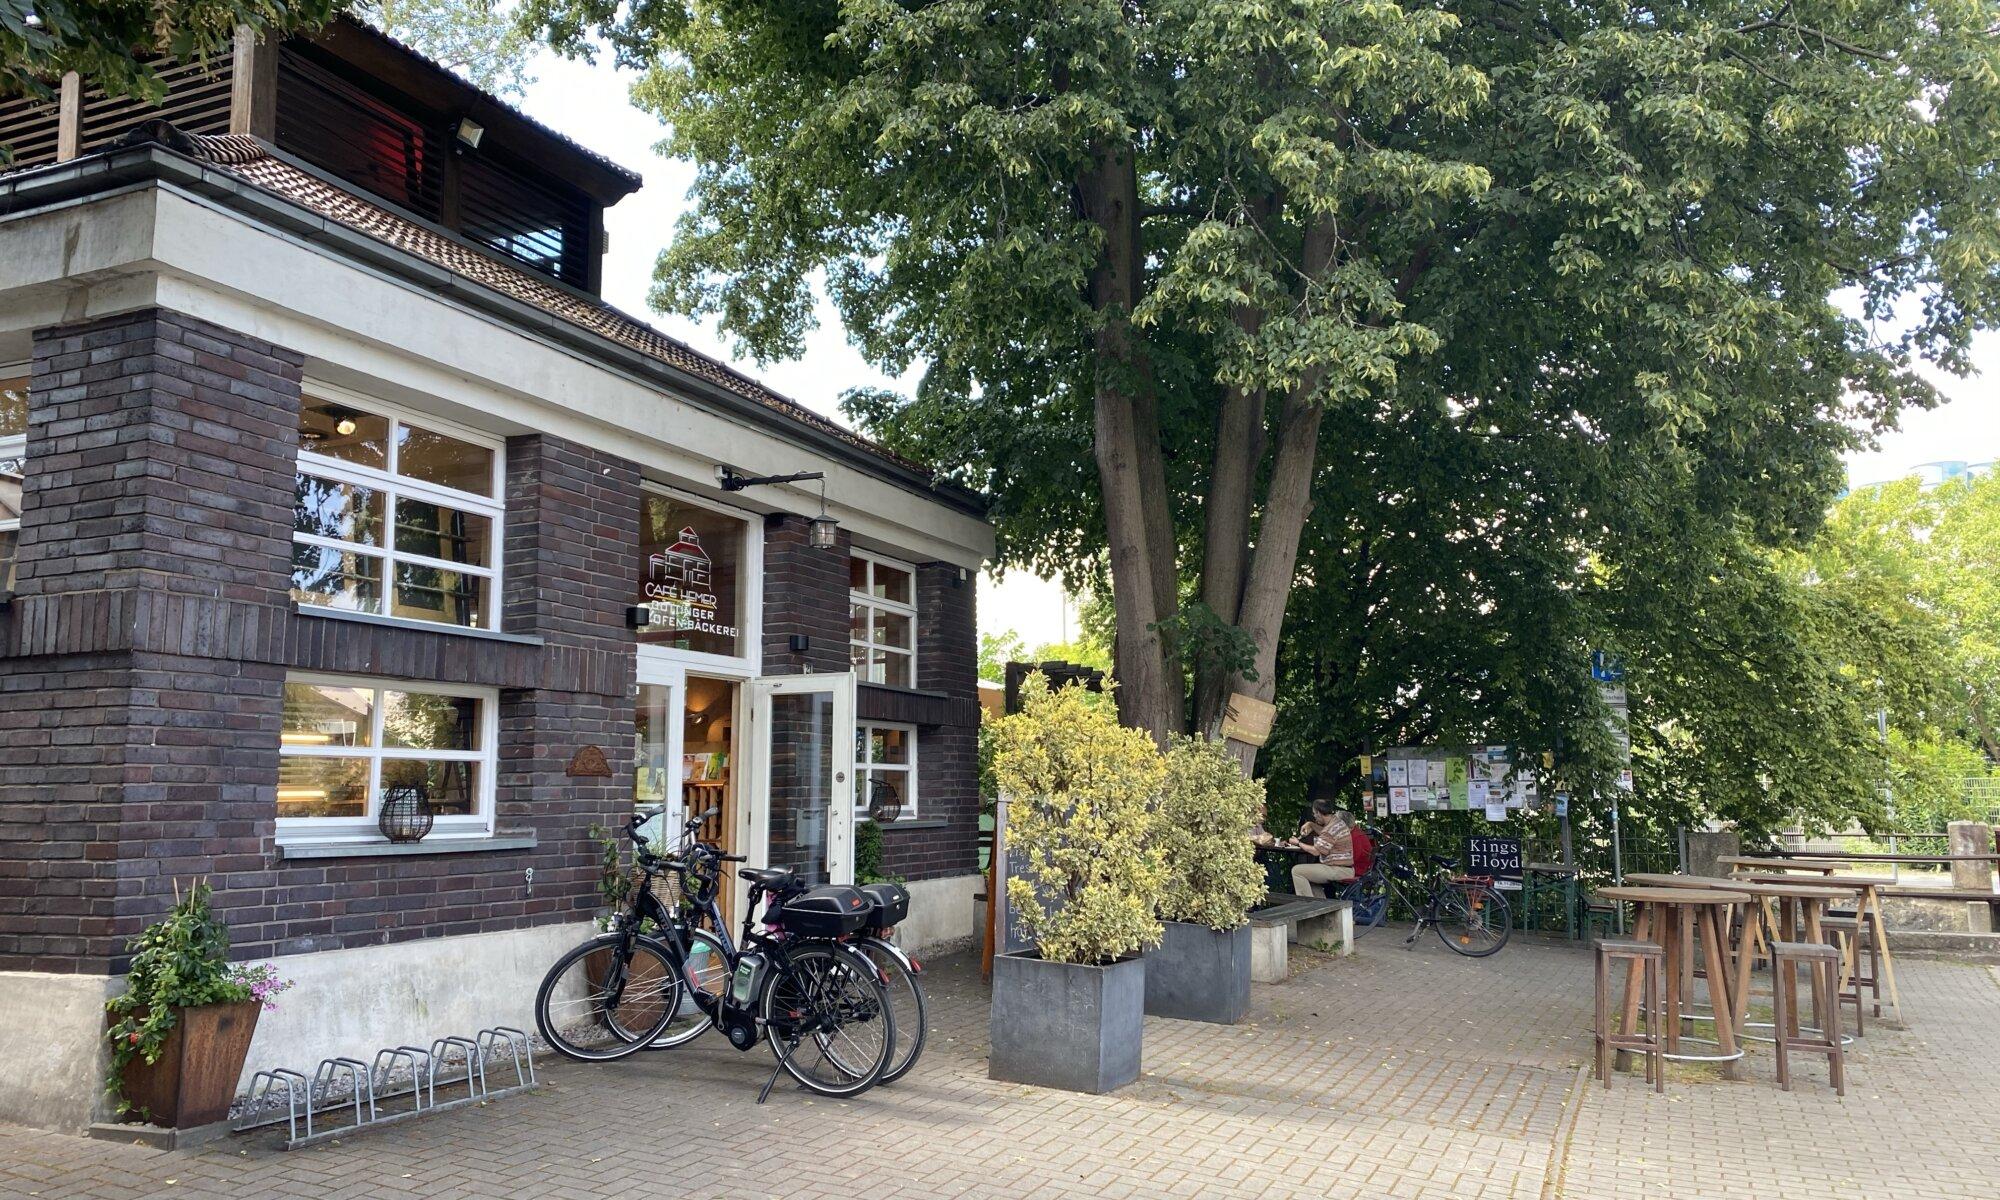 Café Hemer, Göttingen